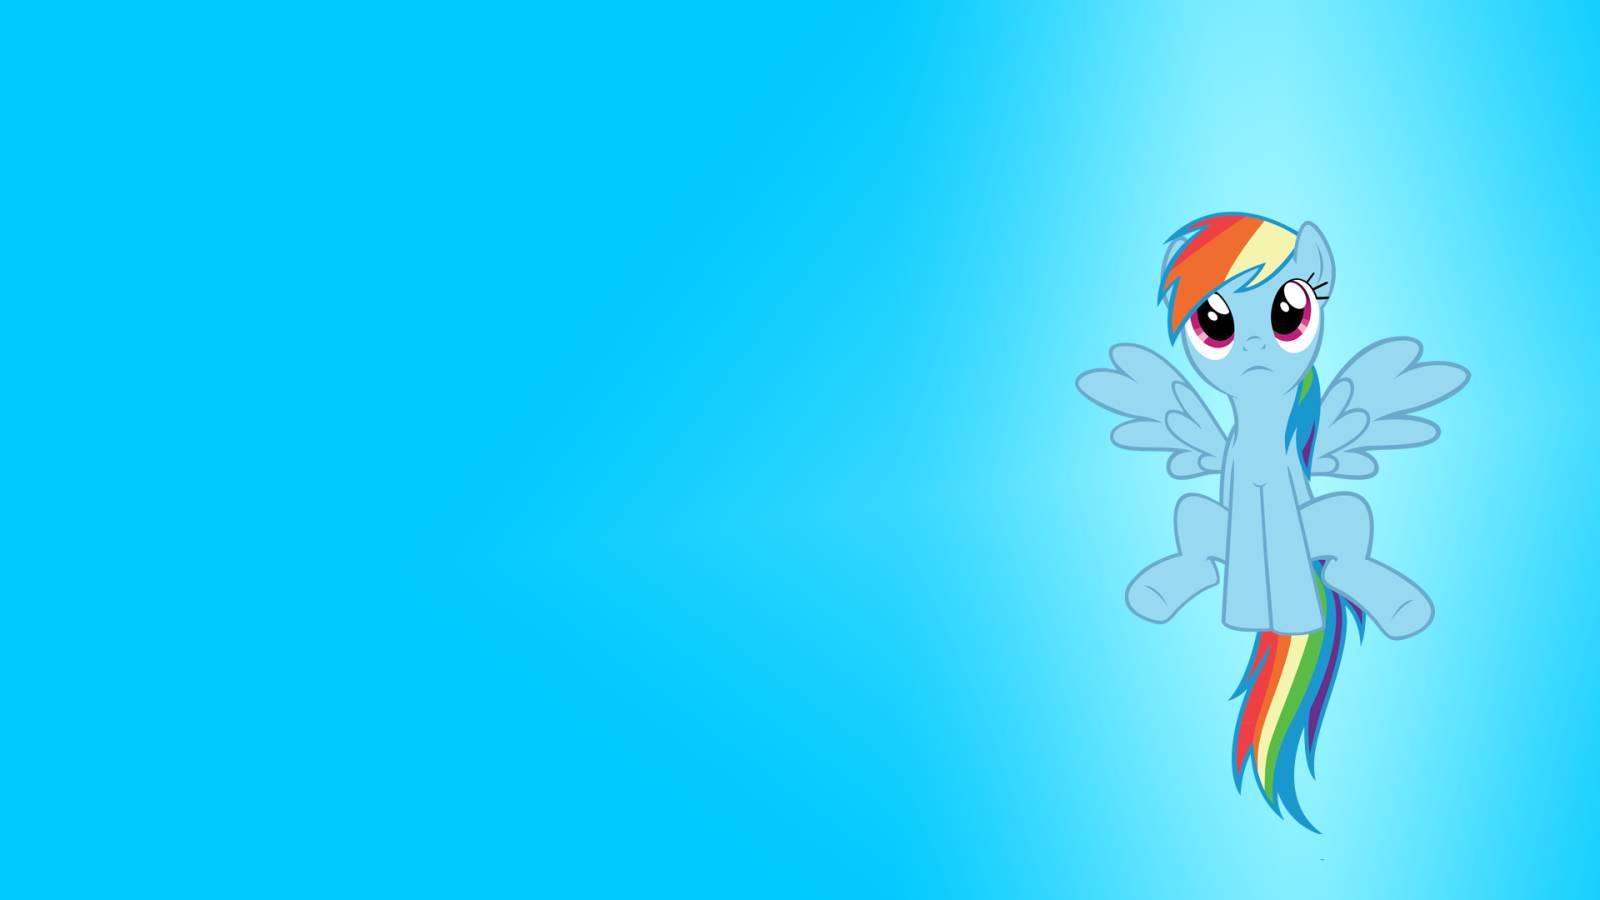 Free Download Rainbow Dash Wallpaper My Little Pony Friendship Is